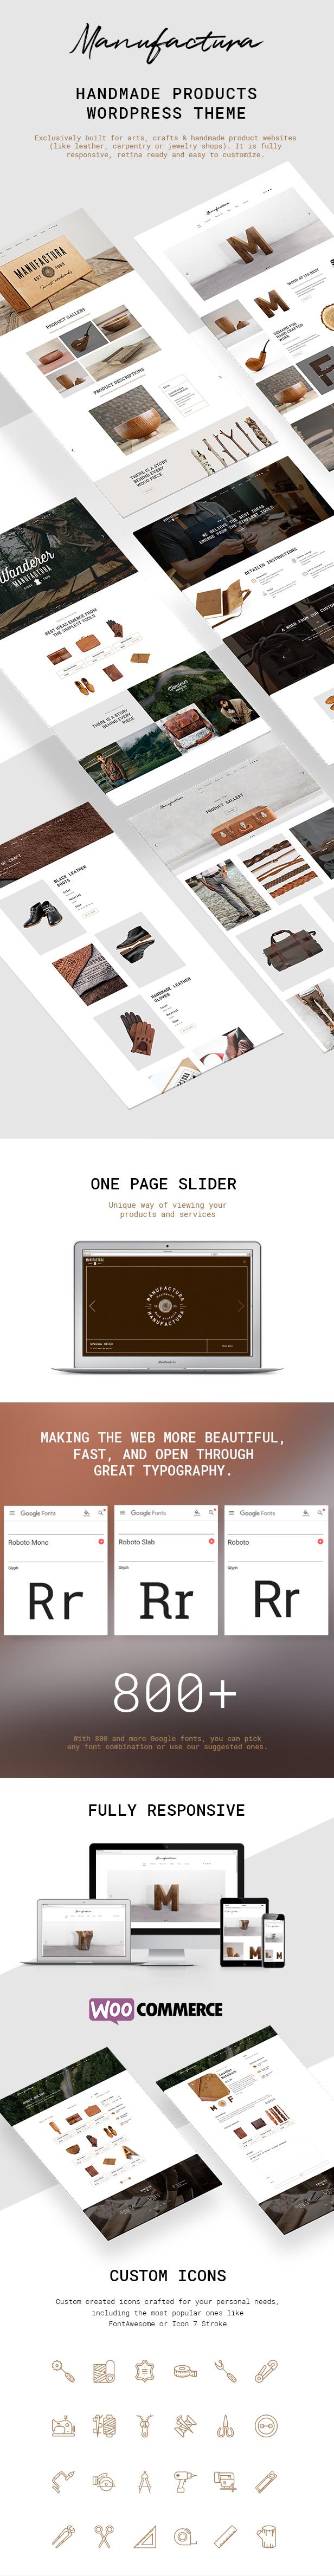 Manufactura - Handmade Crafts, Artisan, Artist WordPress Theme - 1